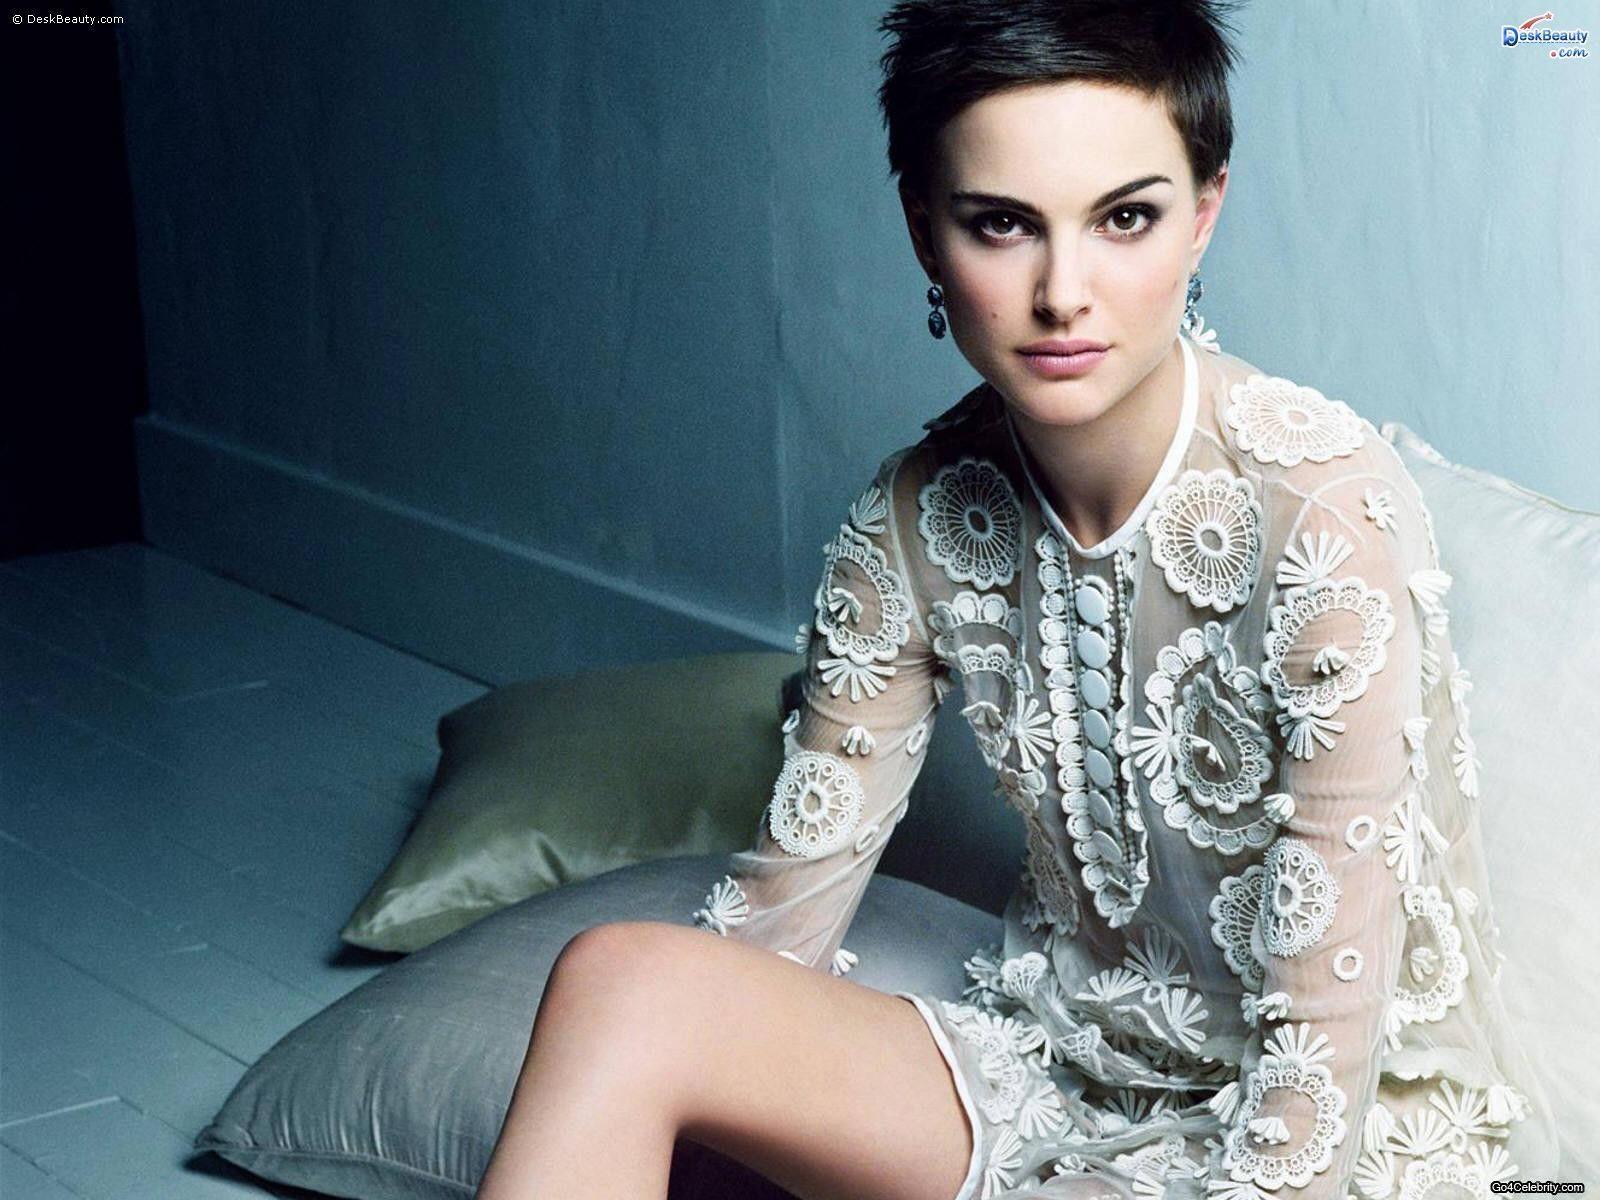 Cute Natalie Portman HD Wallpapers - HD Wallpapers Inn